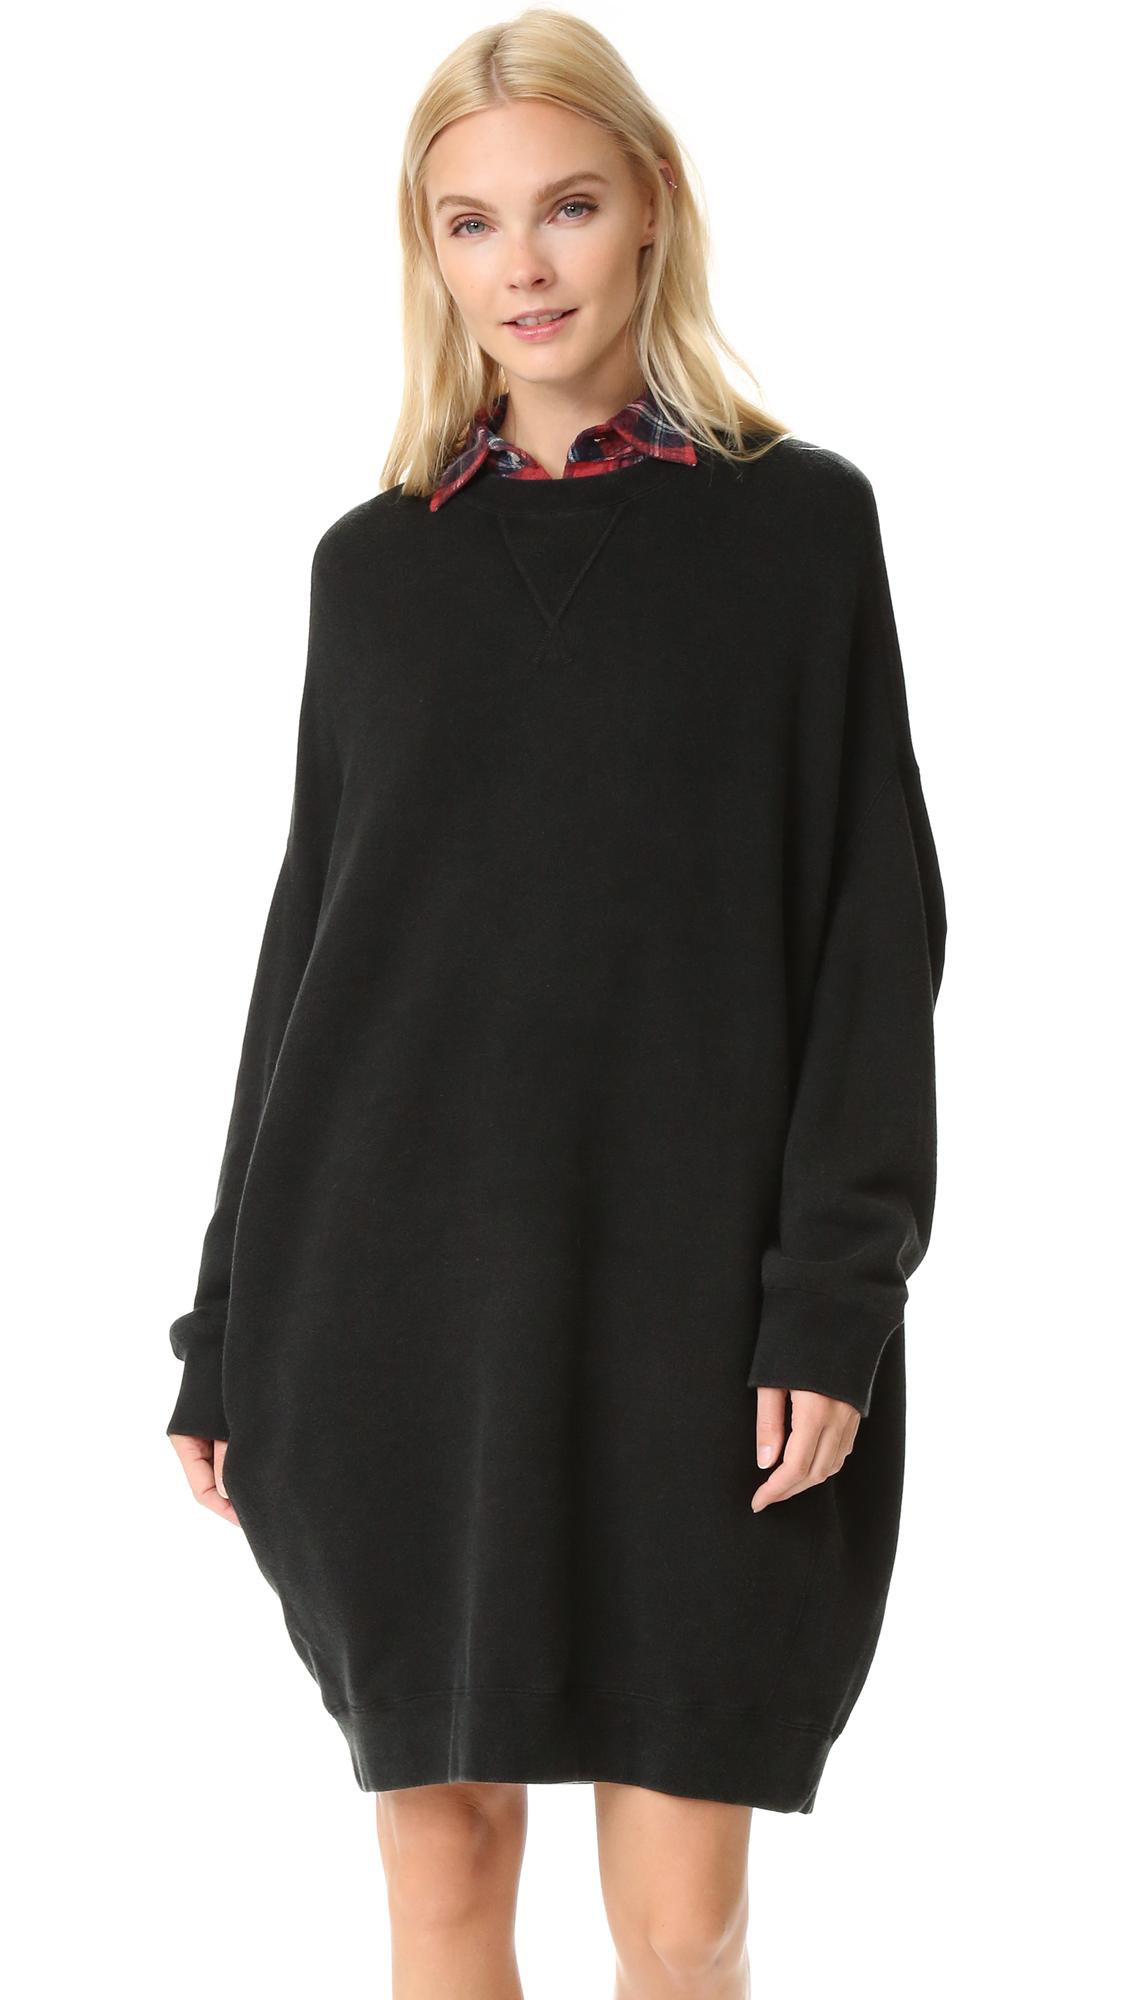 R13 Grunge Sweatshirt Dress - Sand Washed Black